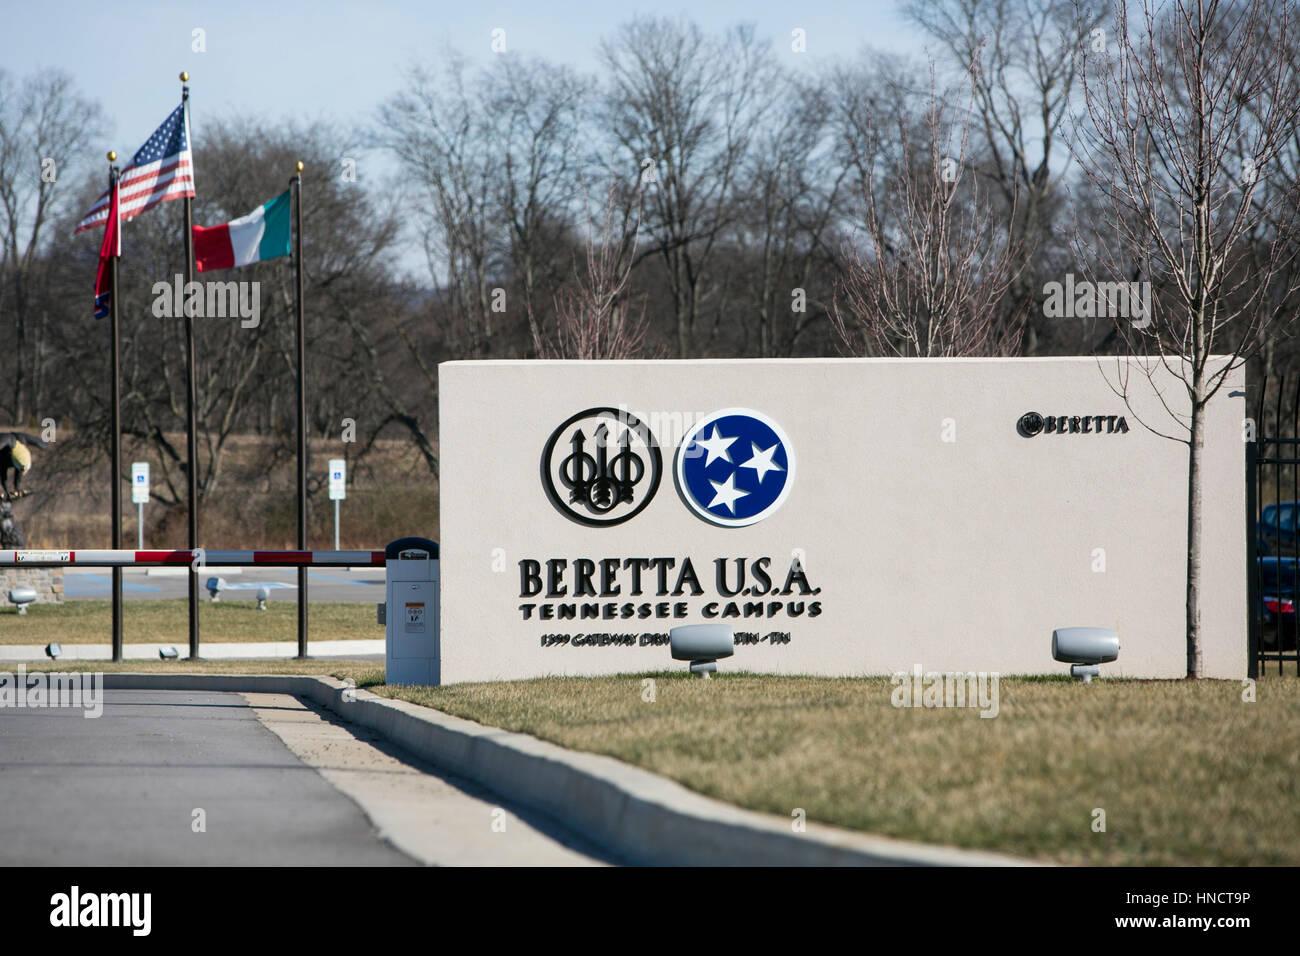 Beretta Stock Photos & Beretta Stock Images - Alamy